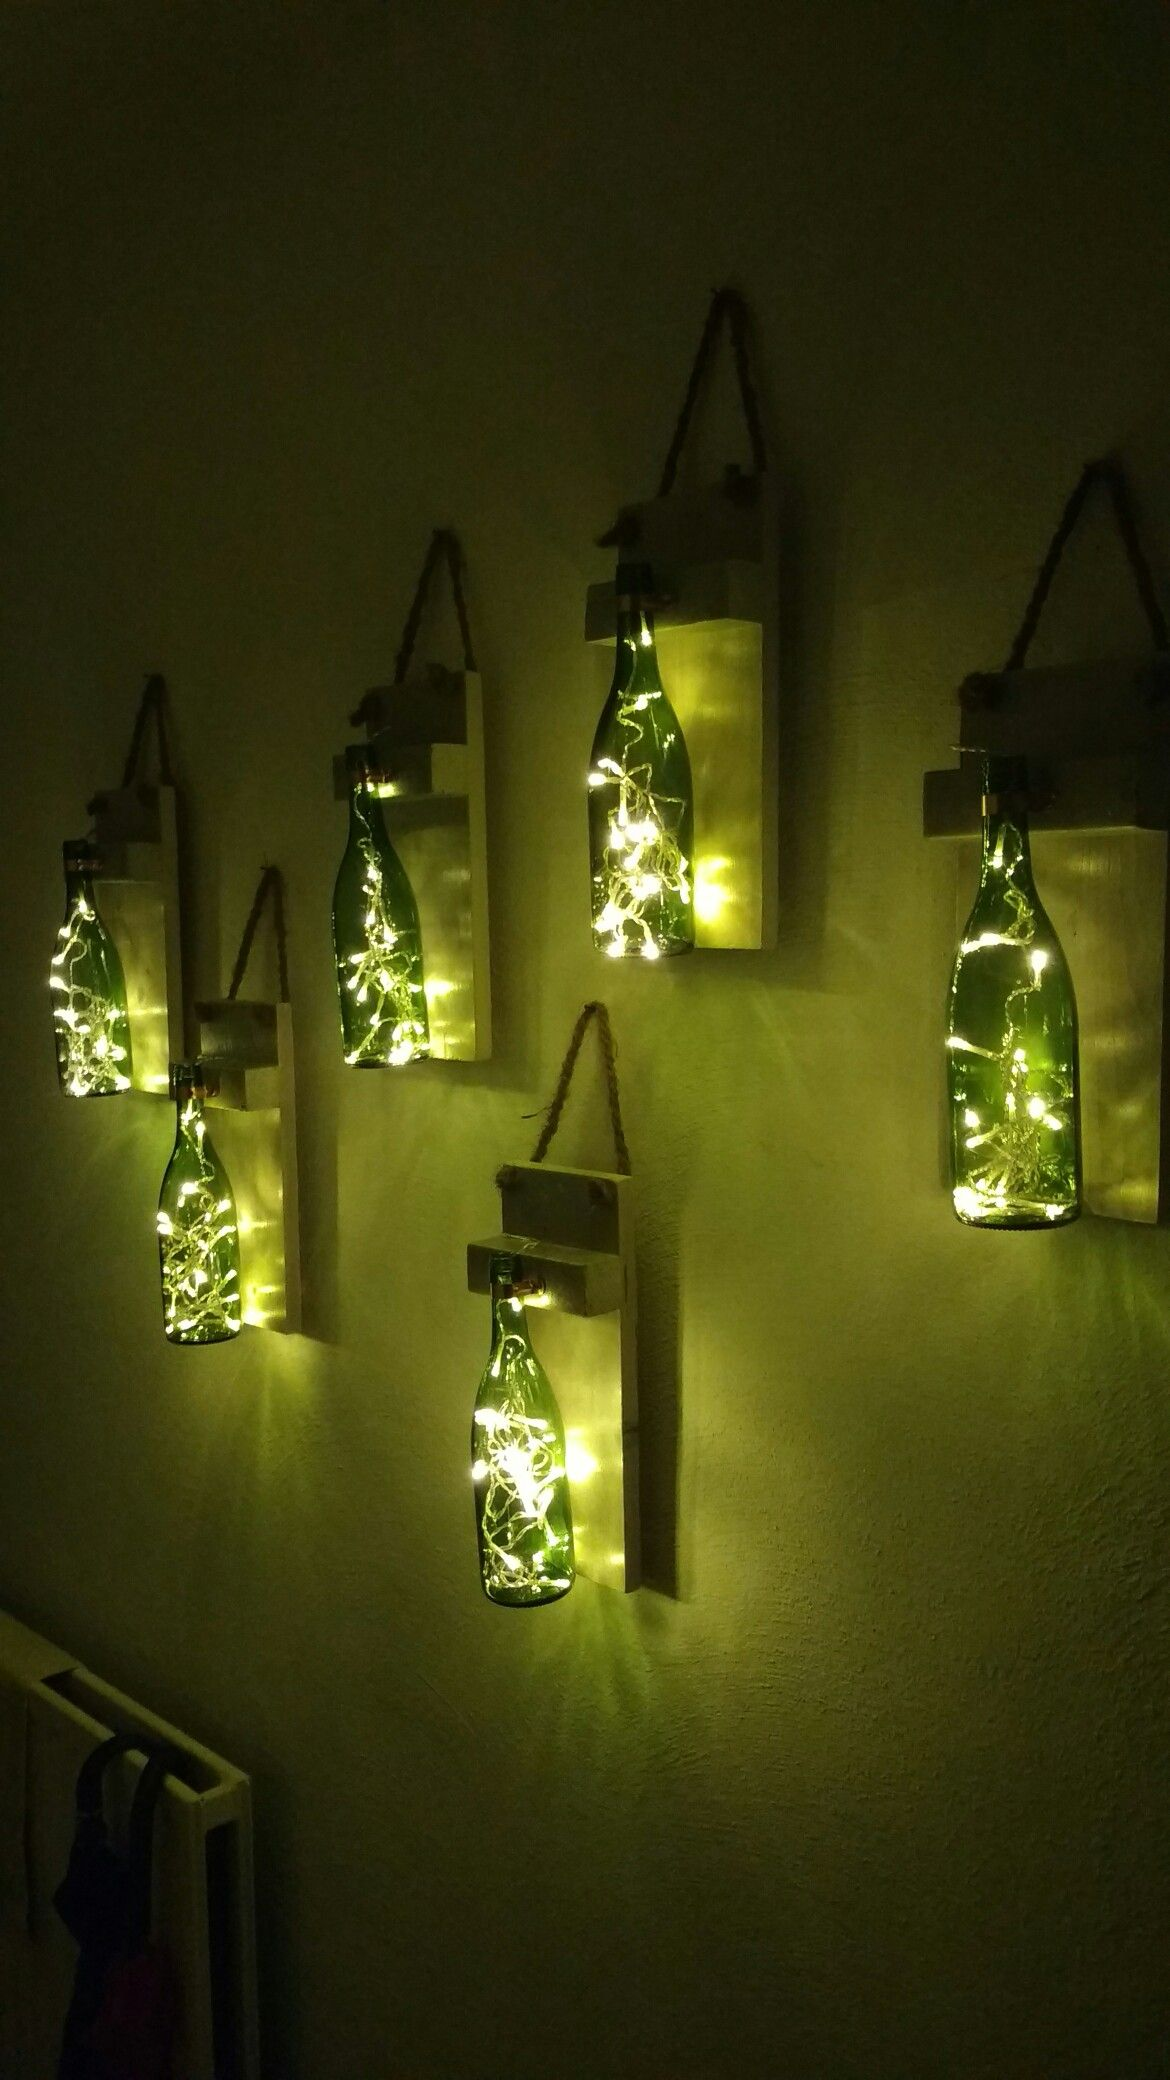 Lege Wijnflessen, Batterij Lampjes, Een Plankje En Touw, En Je